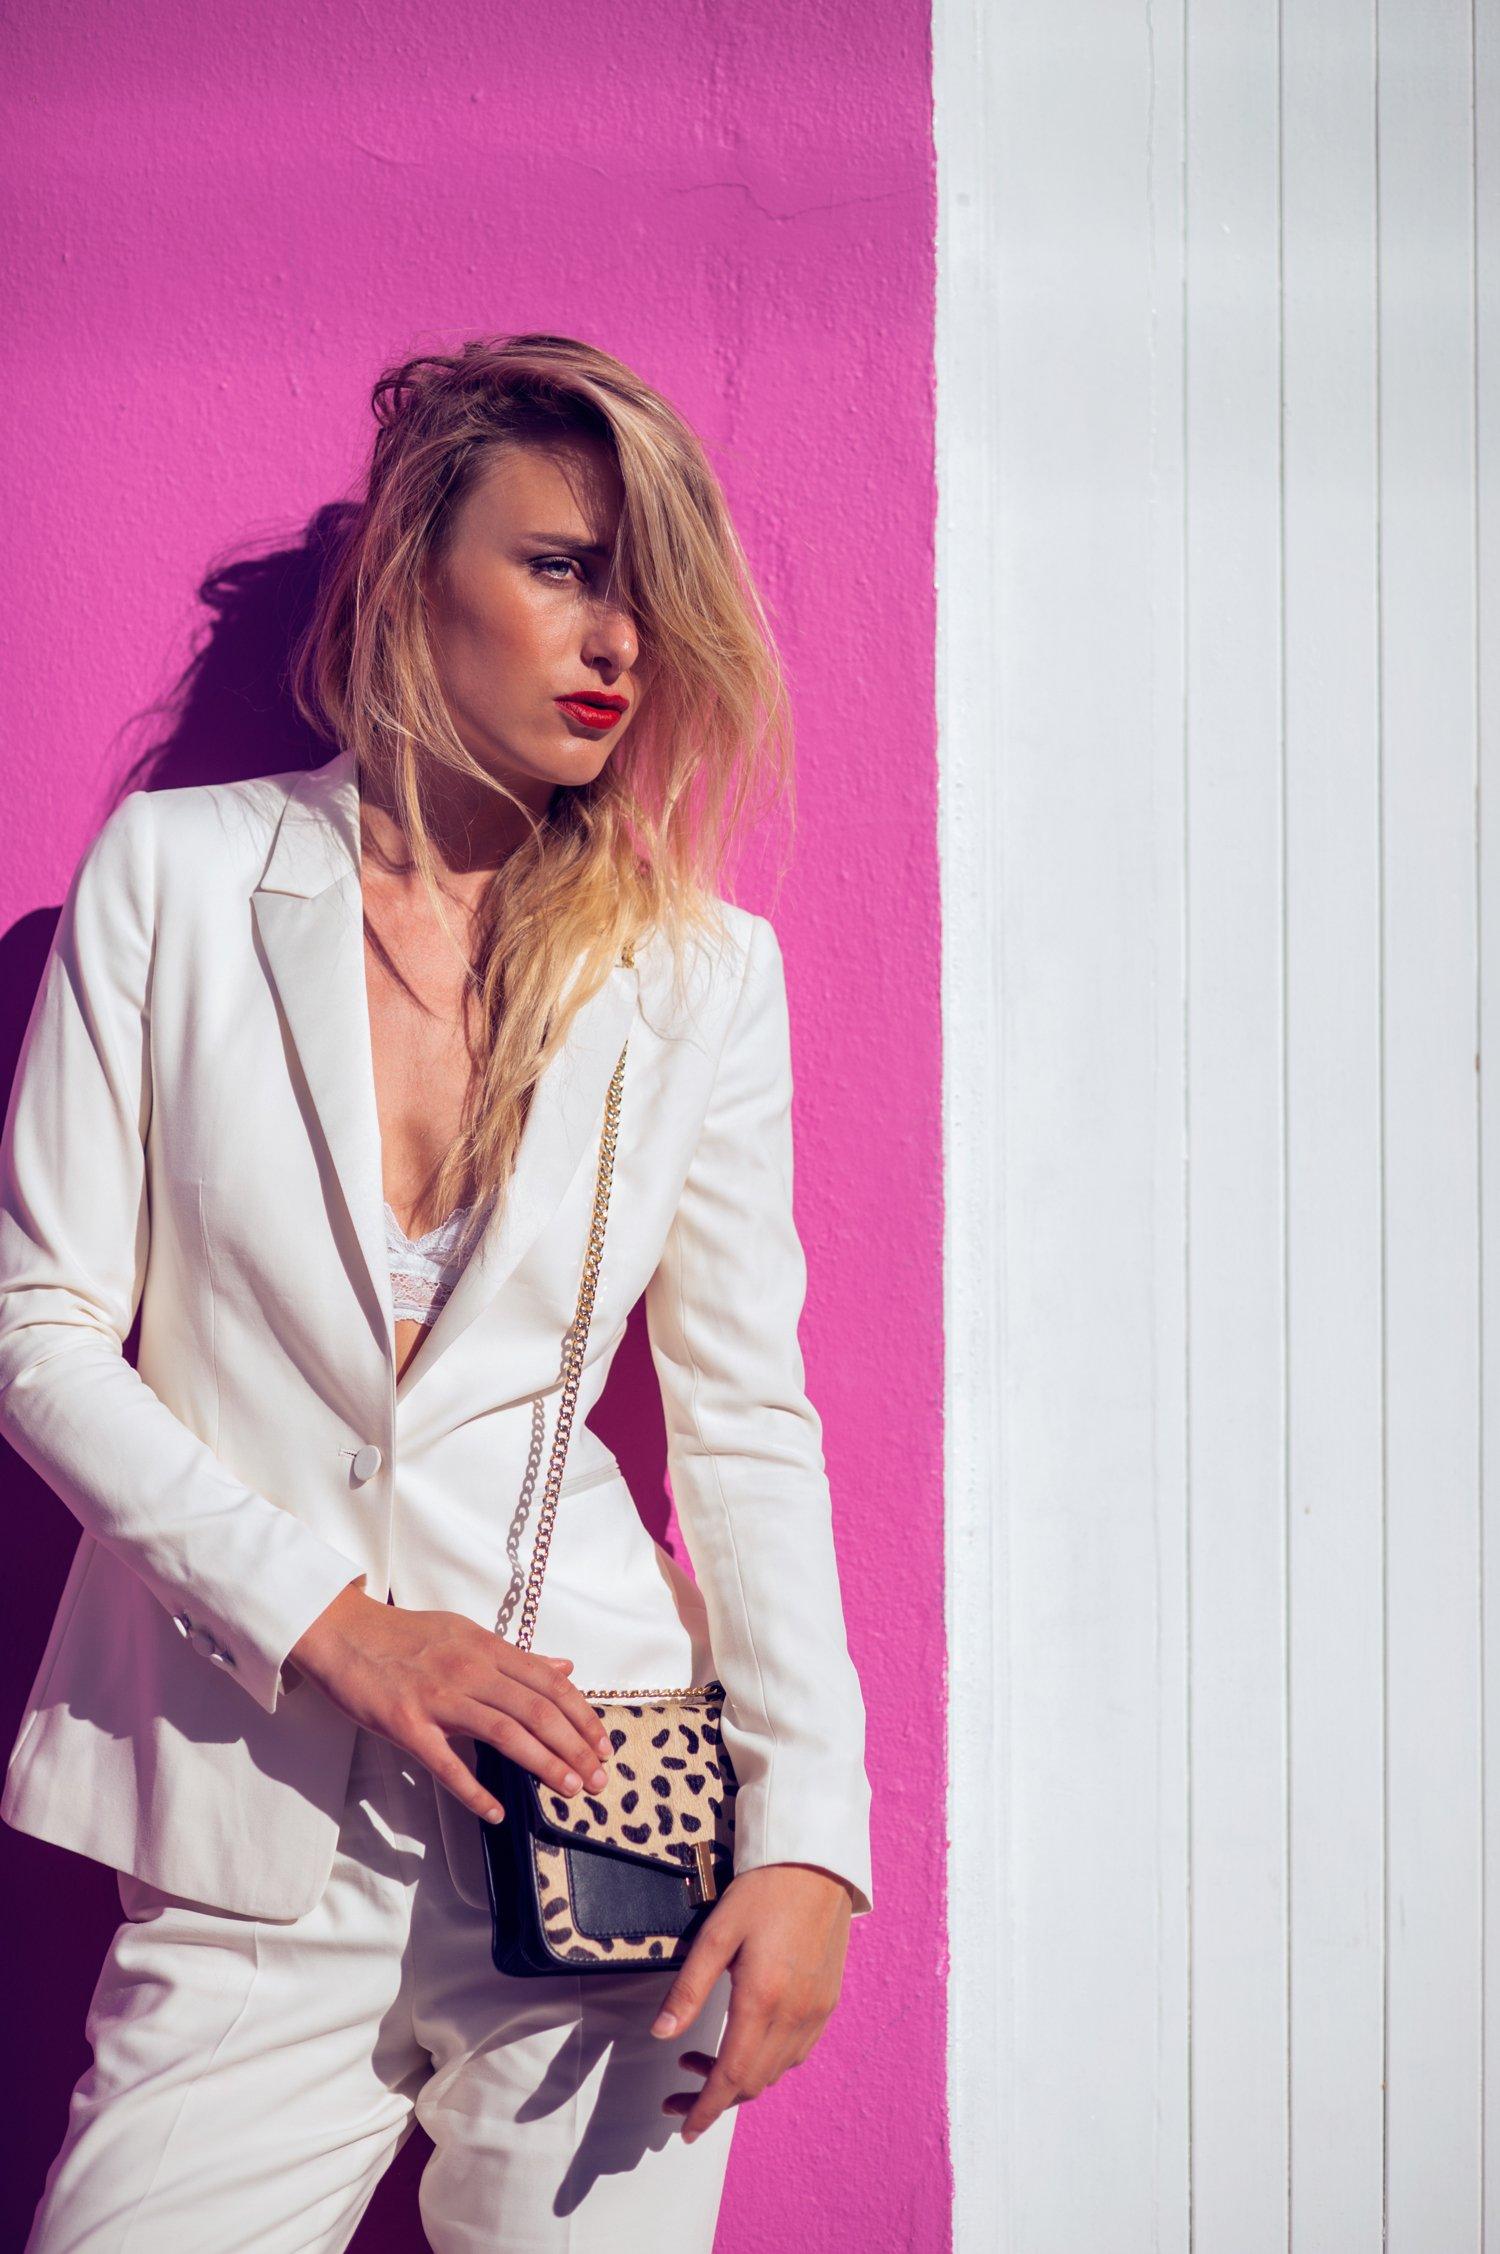 bo kaap fashion blogger